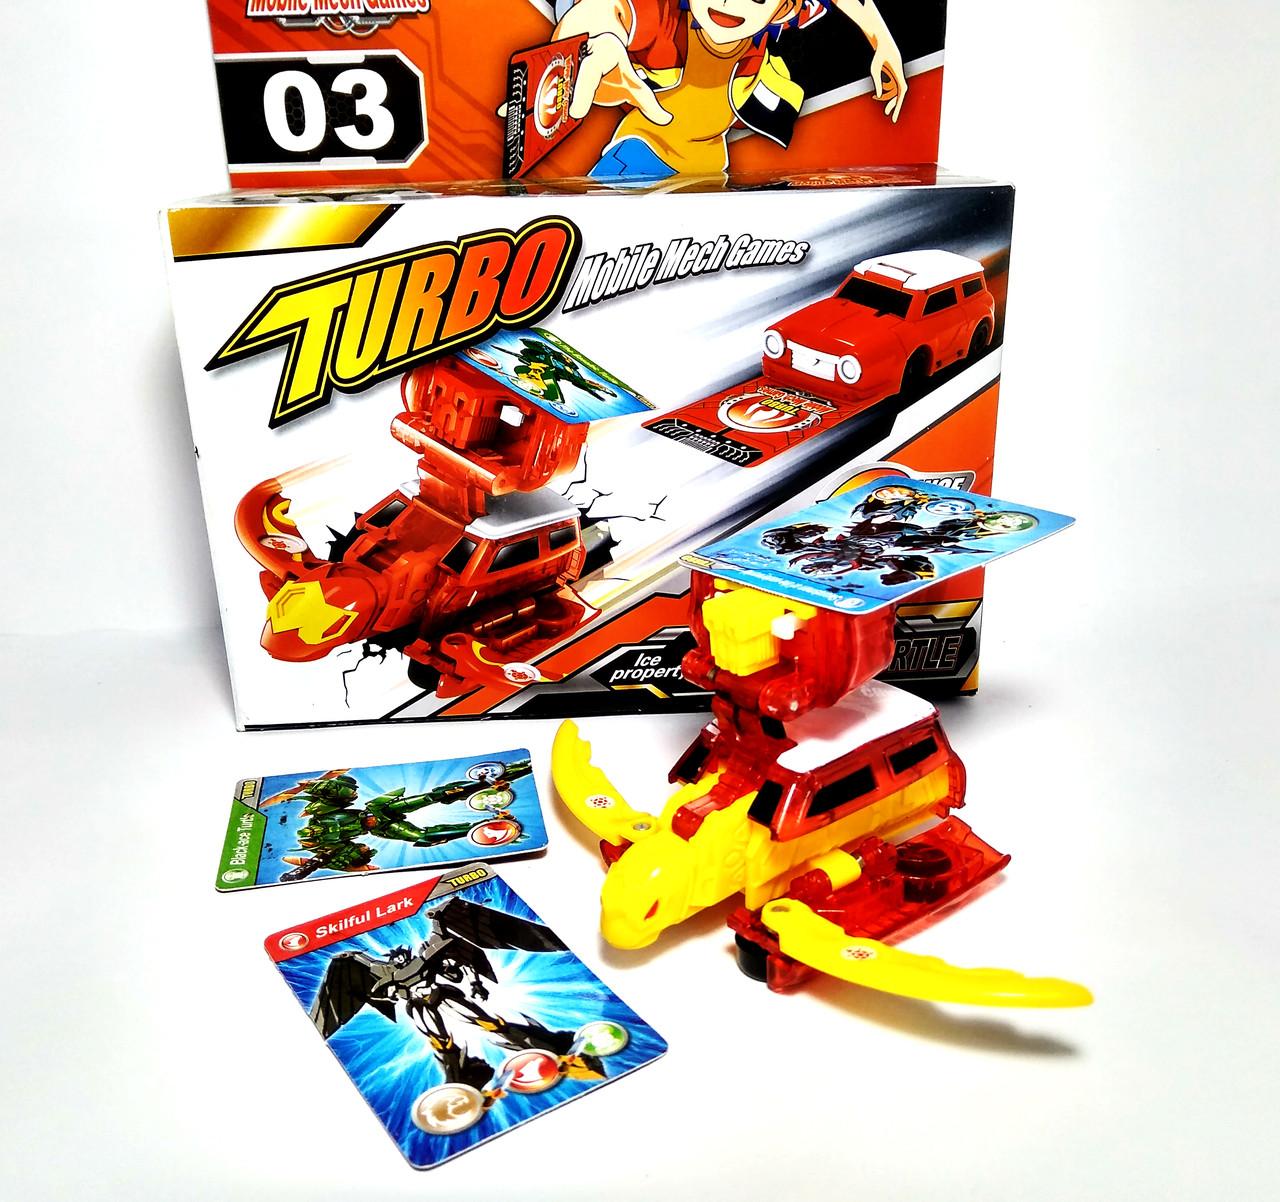 Робот-трансформер 03 Черепаха Turbo Mobile Mech Games Shantou Gepai